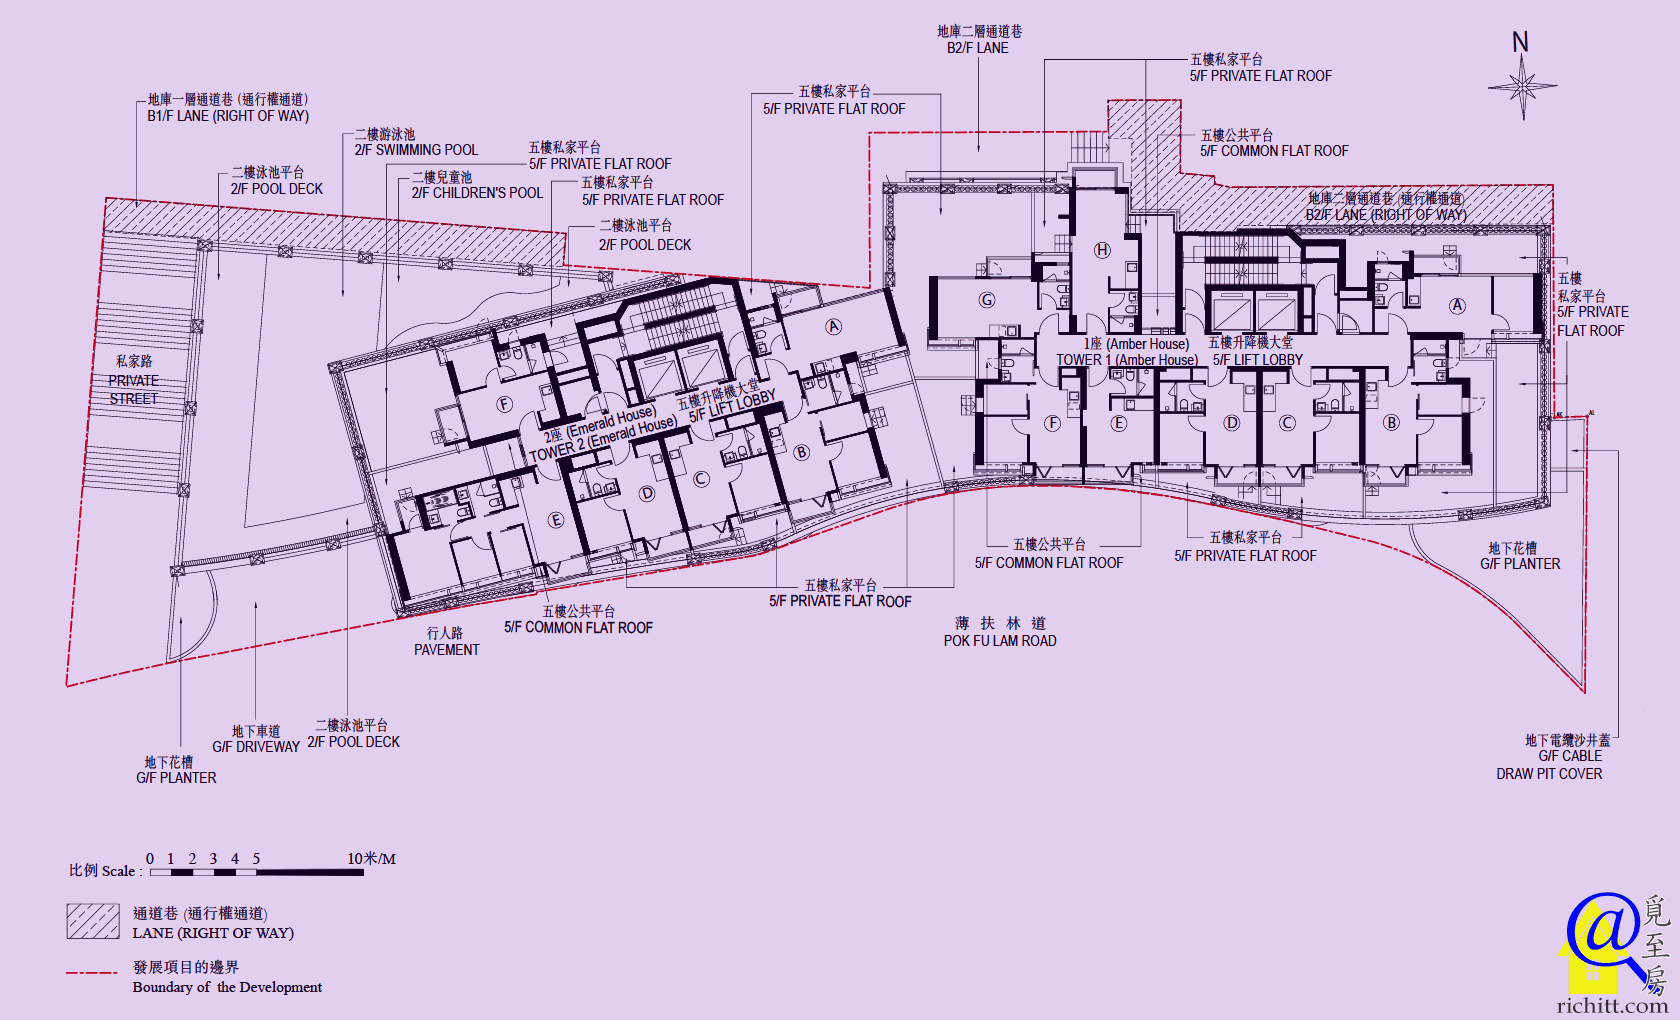 63 Pokfulam佈局圖